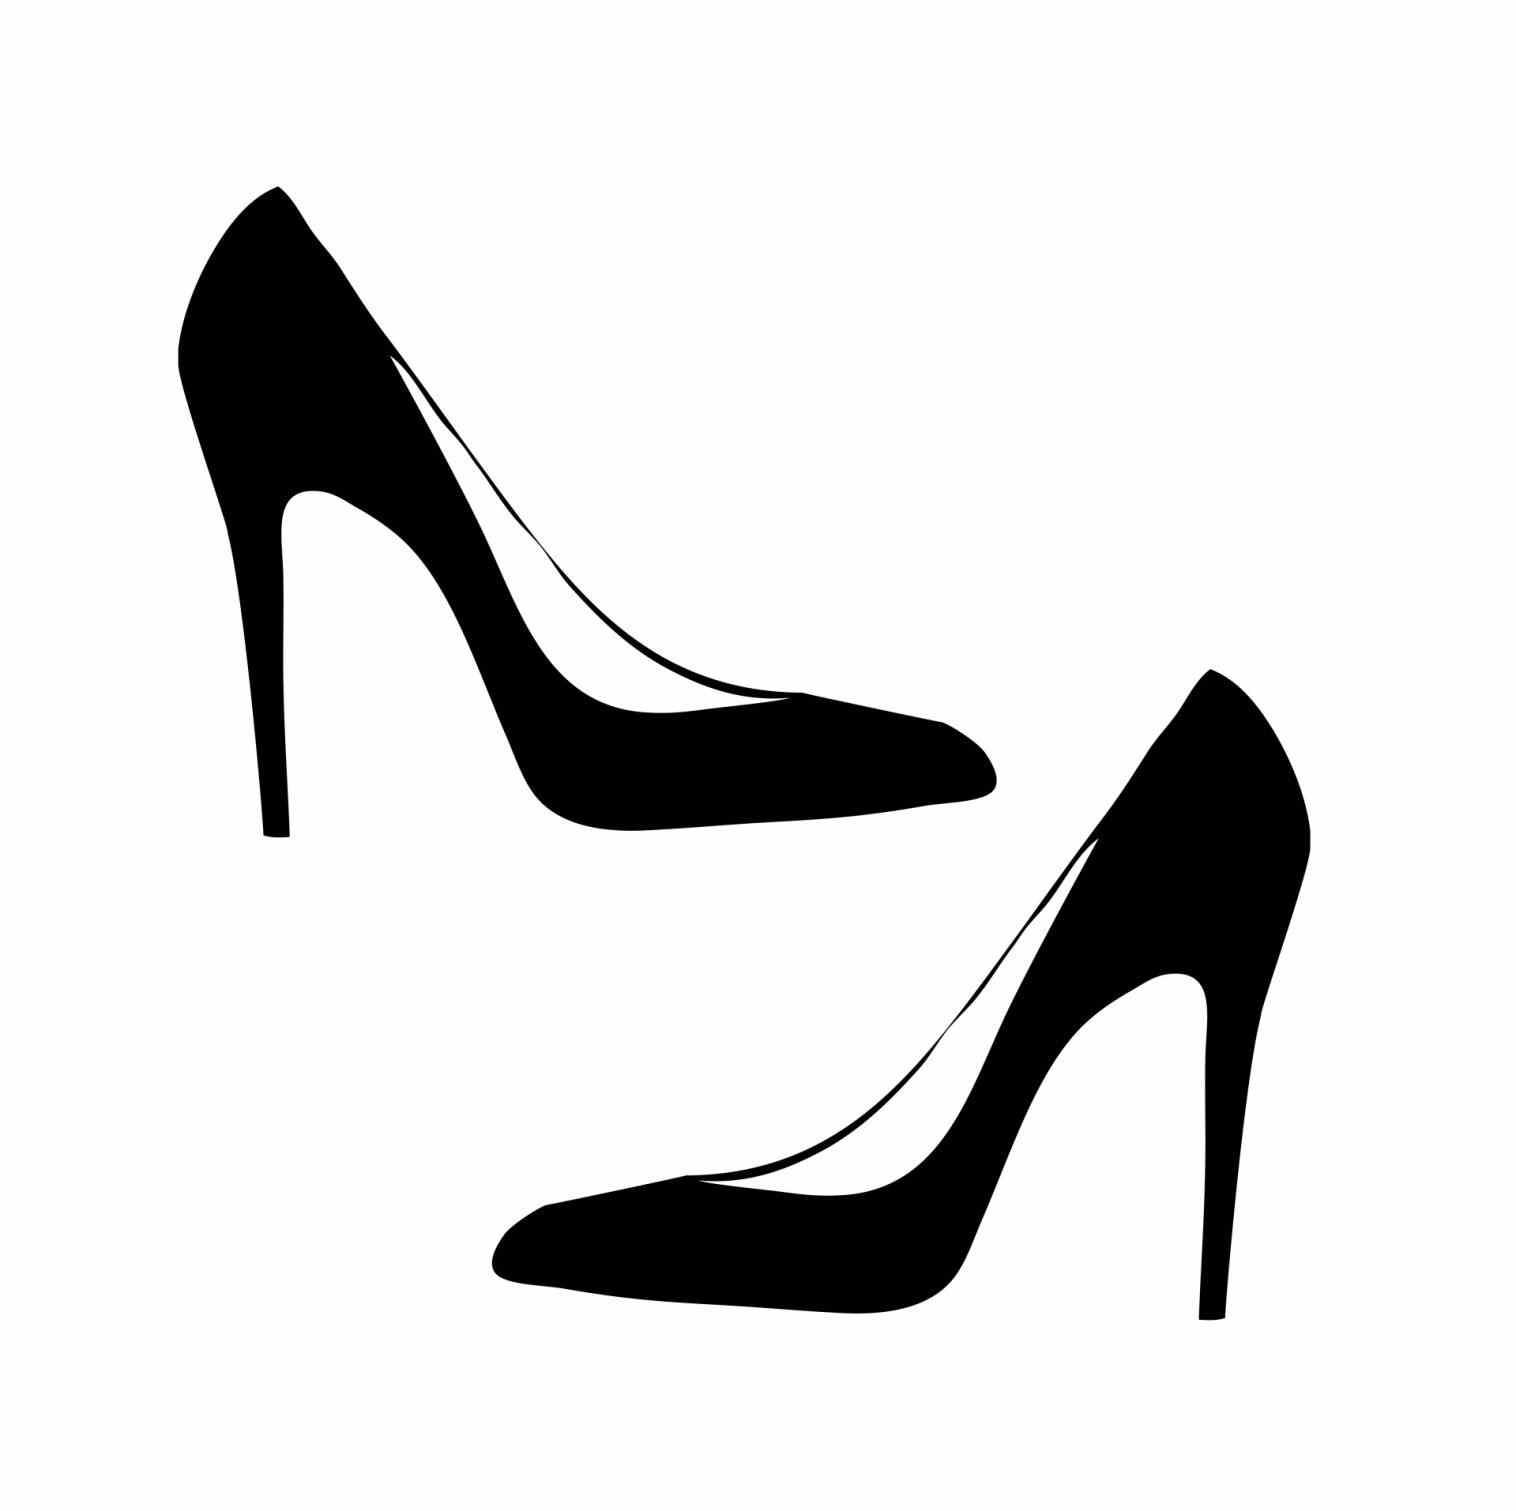 1516x1511 High Heel Silhouette Png